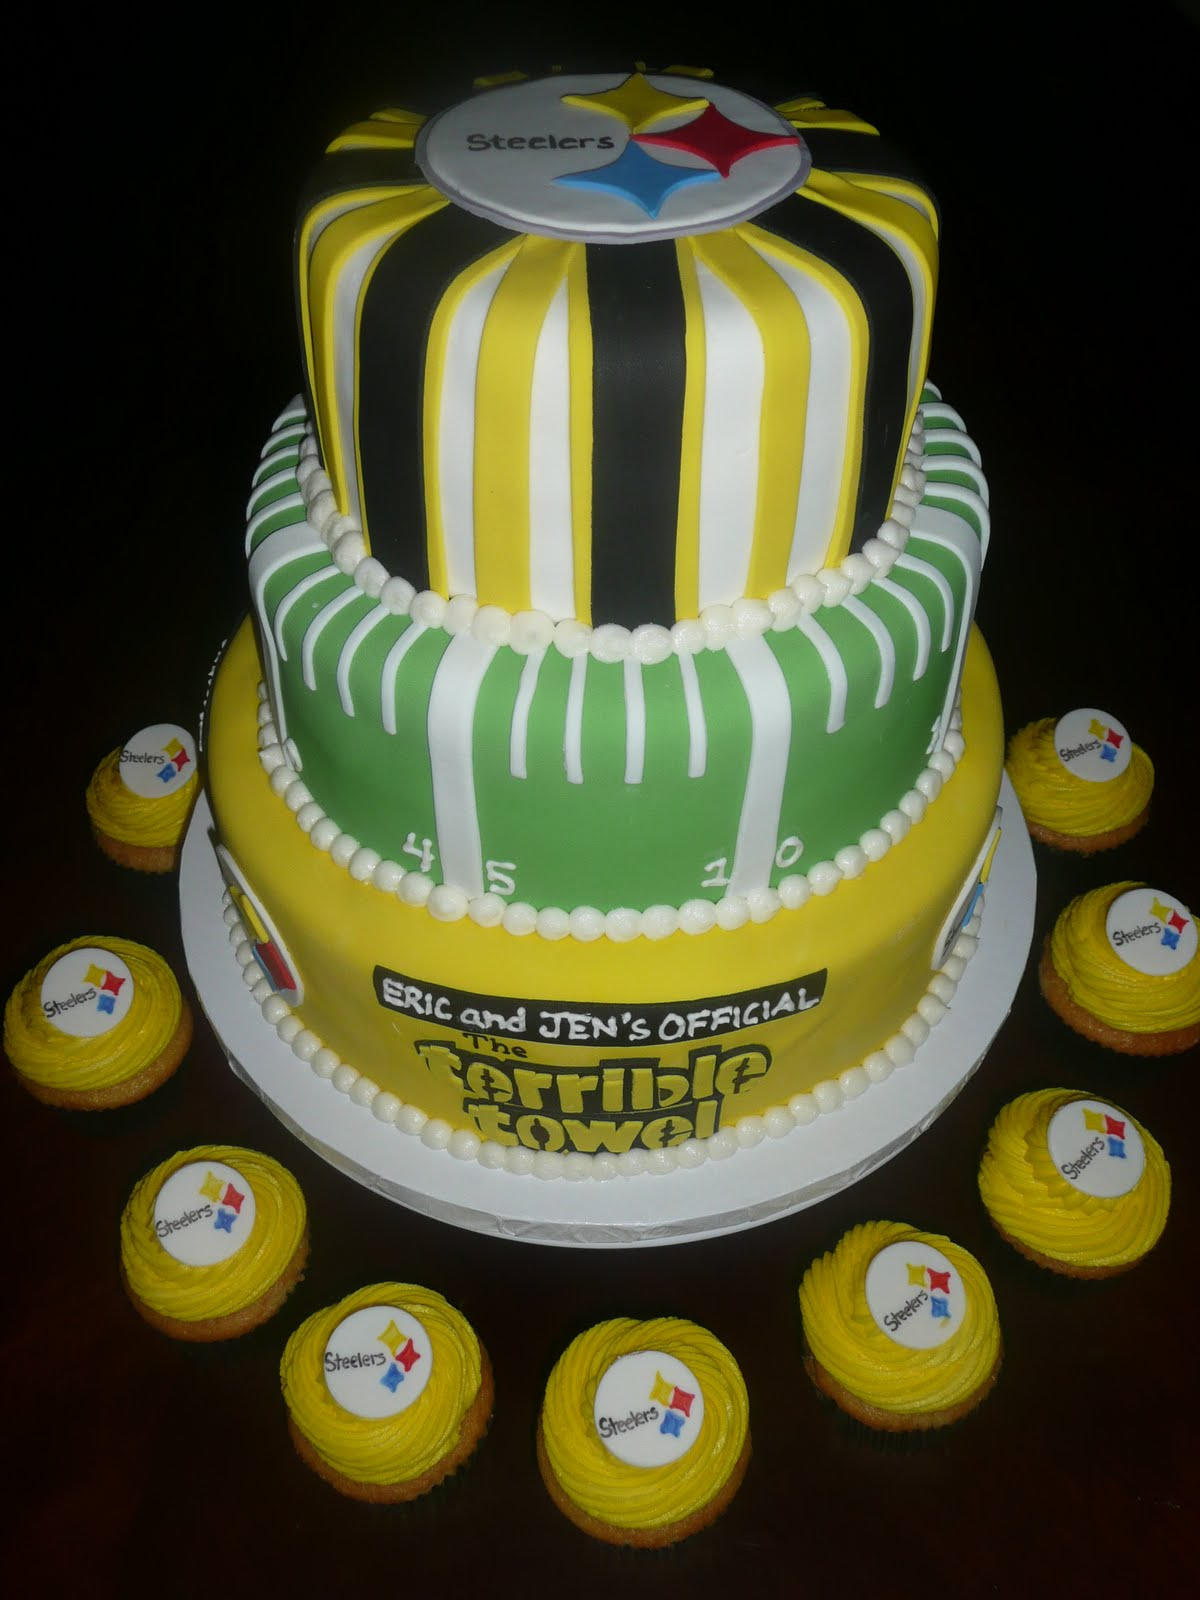 Steelers Football Cupcake Cake Ideas And Designs